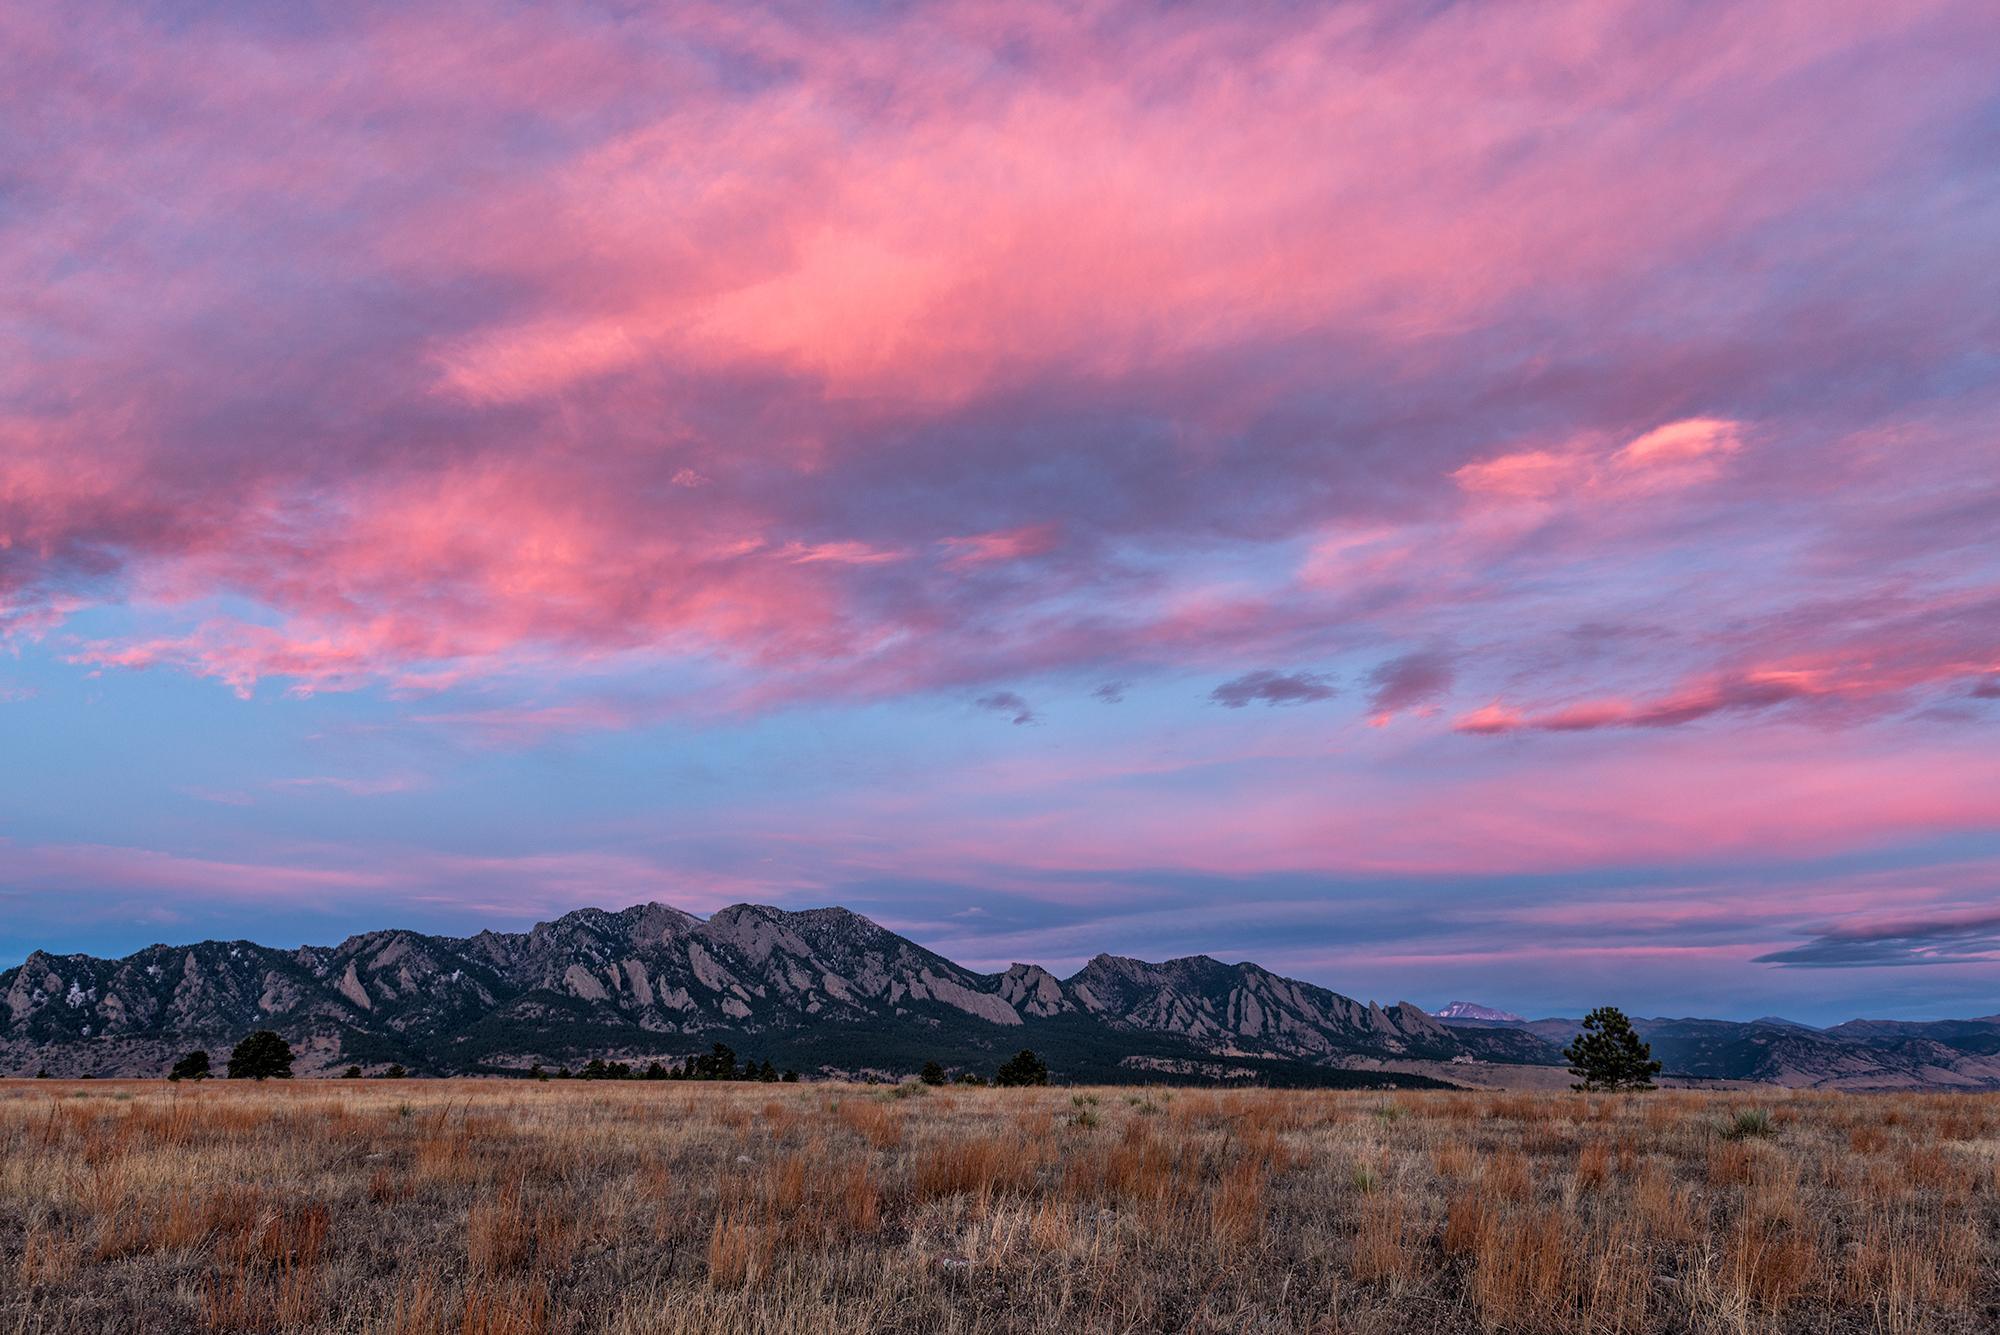 Pink Over the Flatirons. Boulder, Colorado, 2015